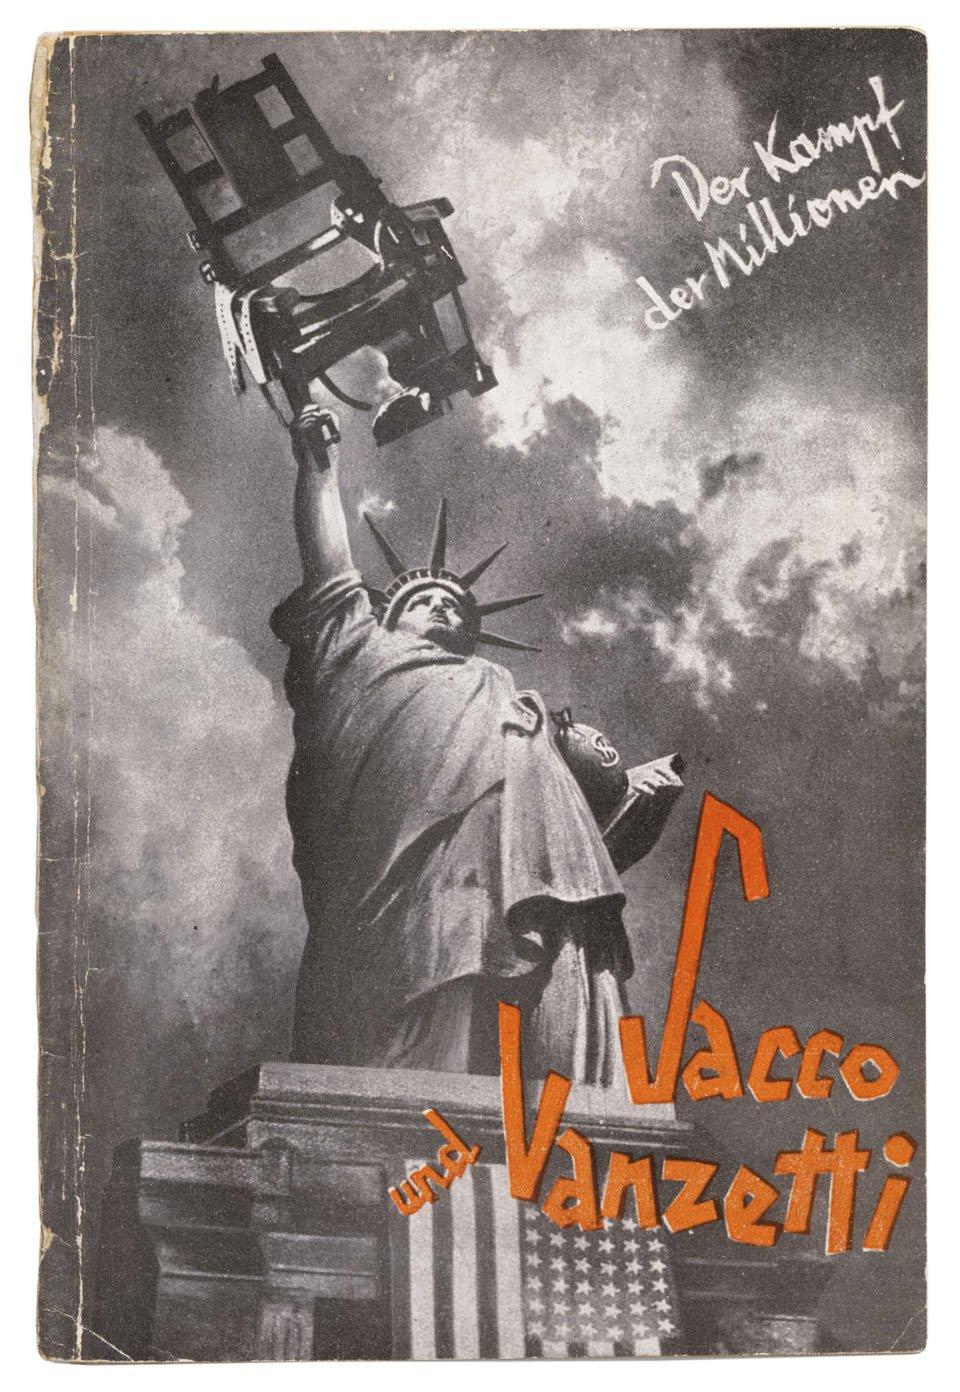 118a_book_covers_weimar_republic_va_04601_1504201456_id_947093